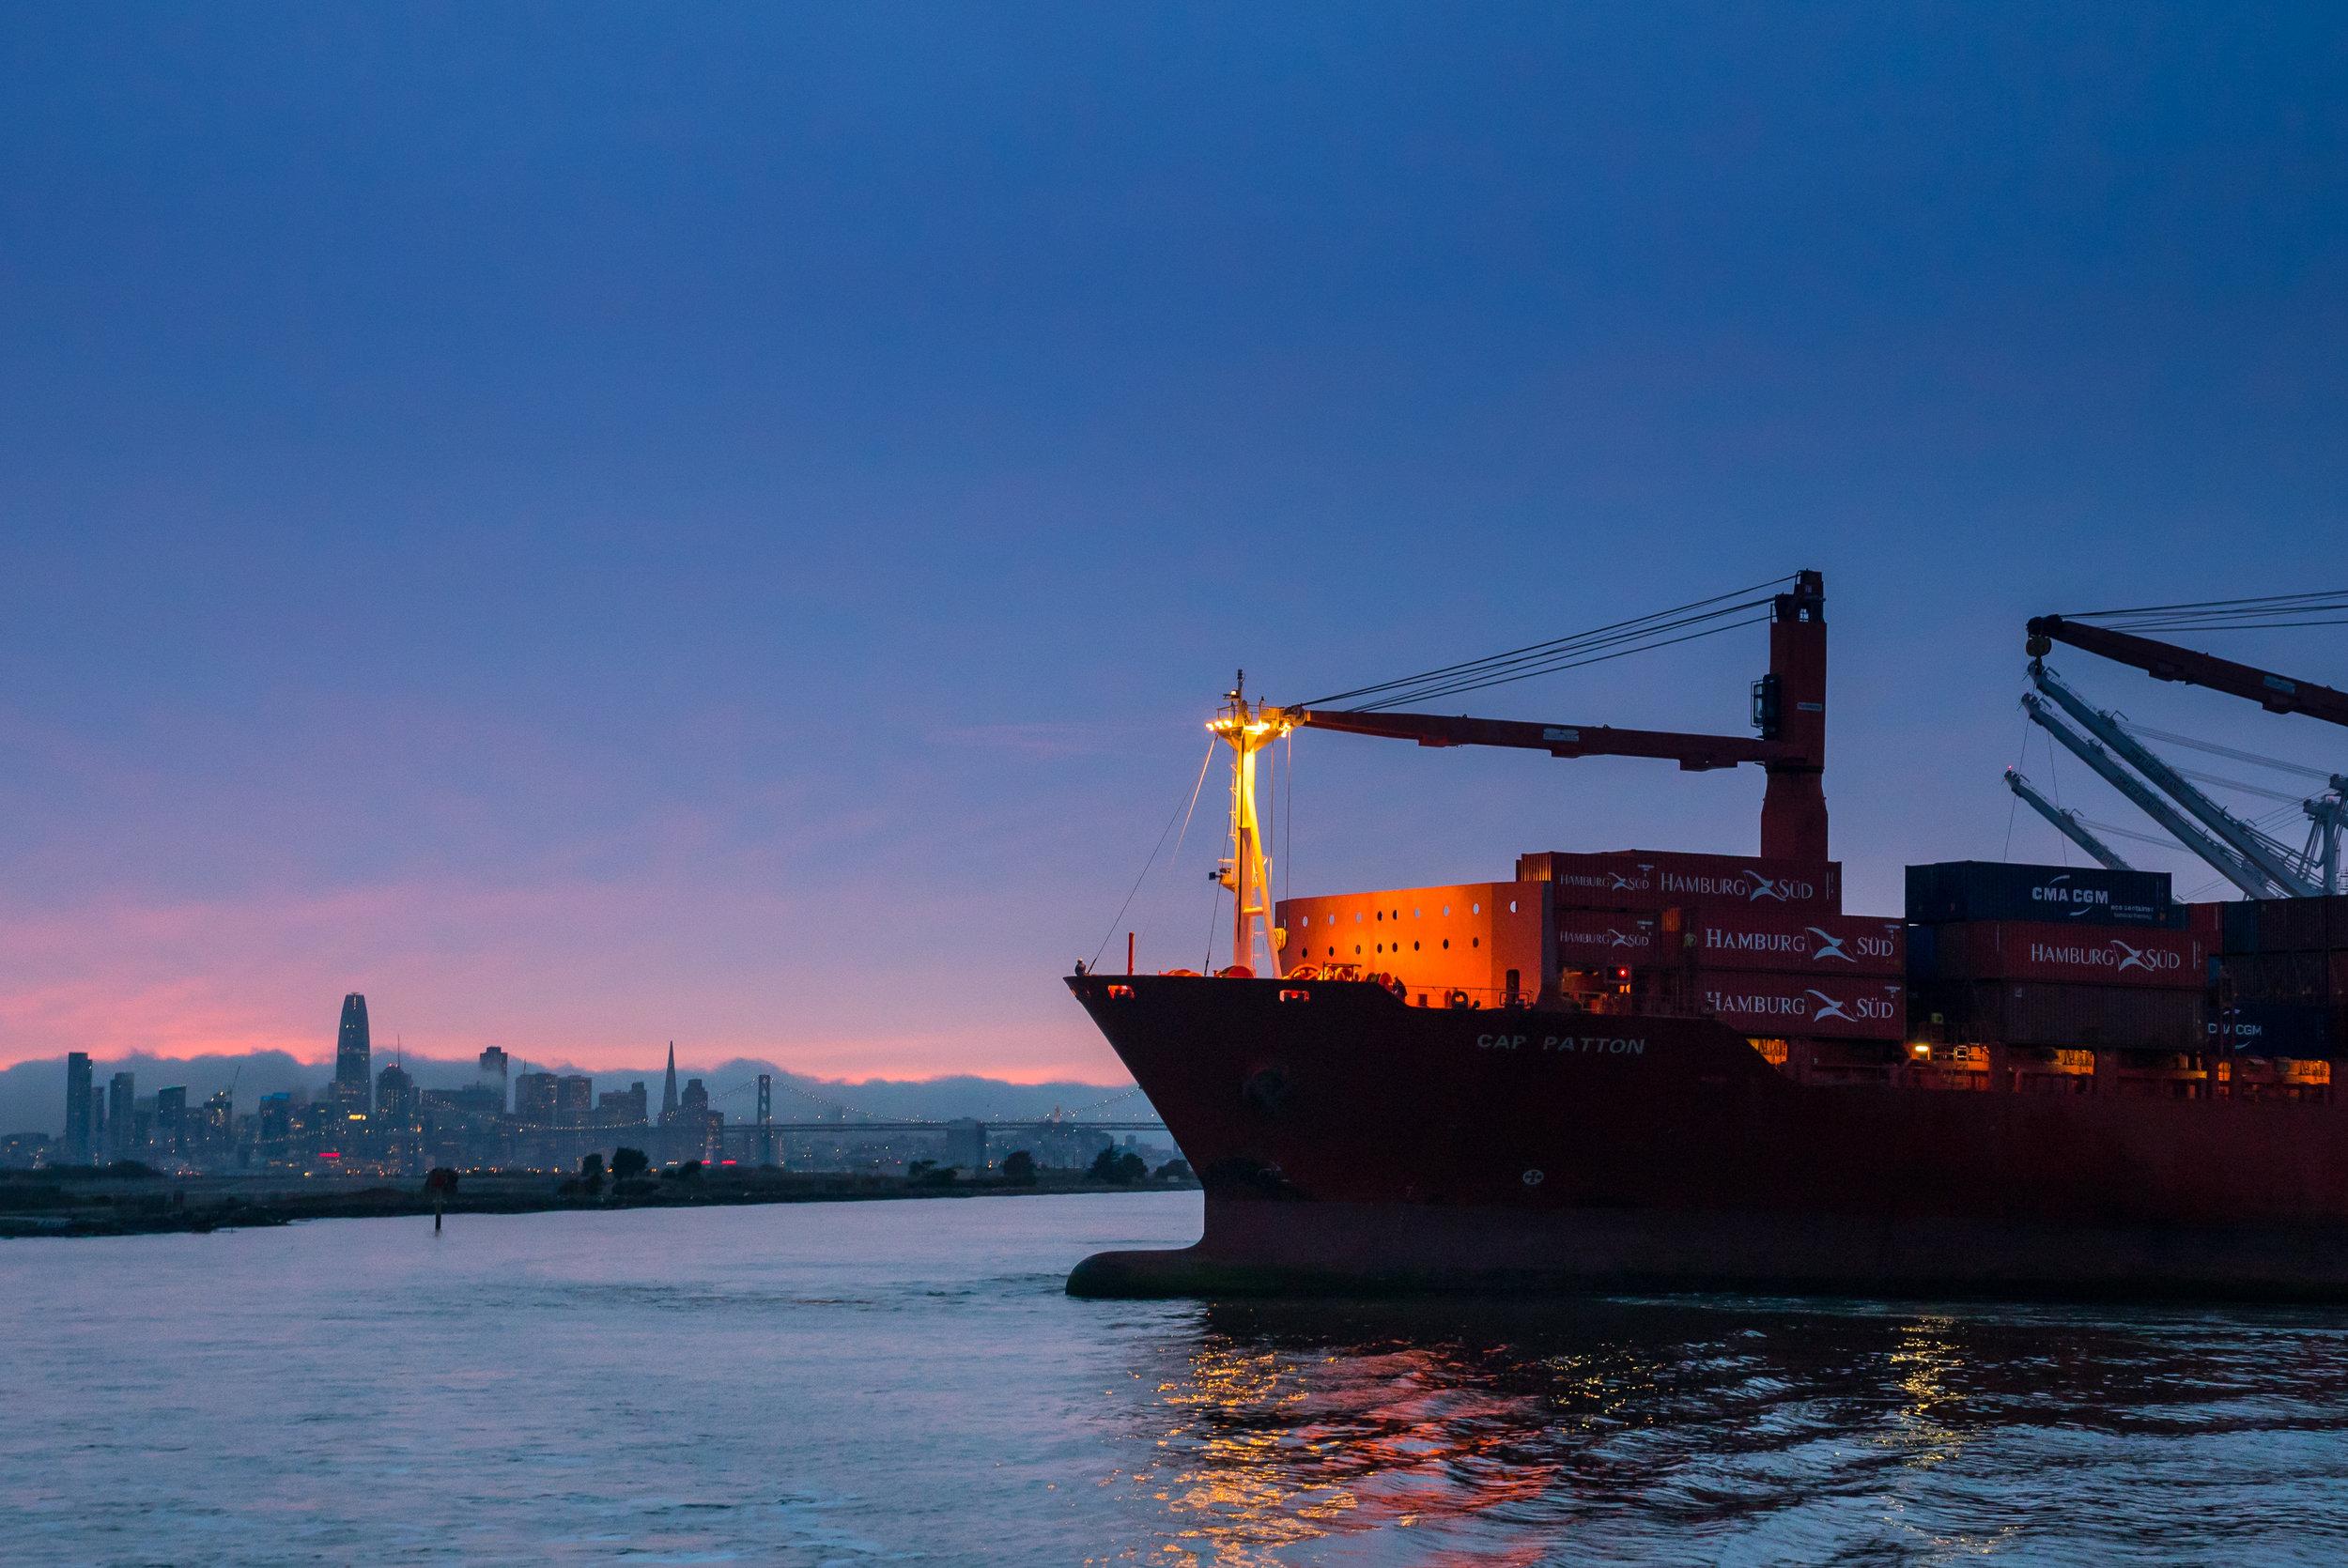 20180309-ferry_sunset-003.jpg